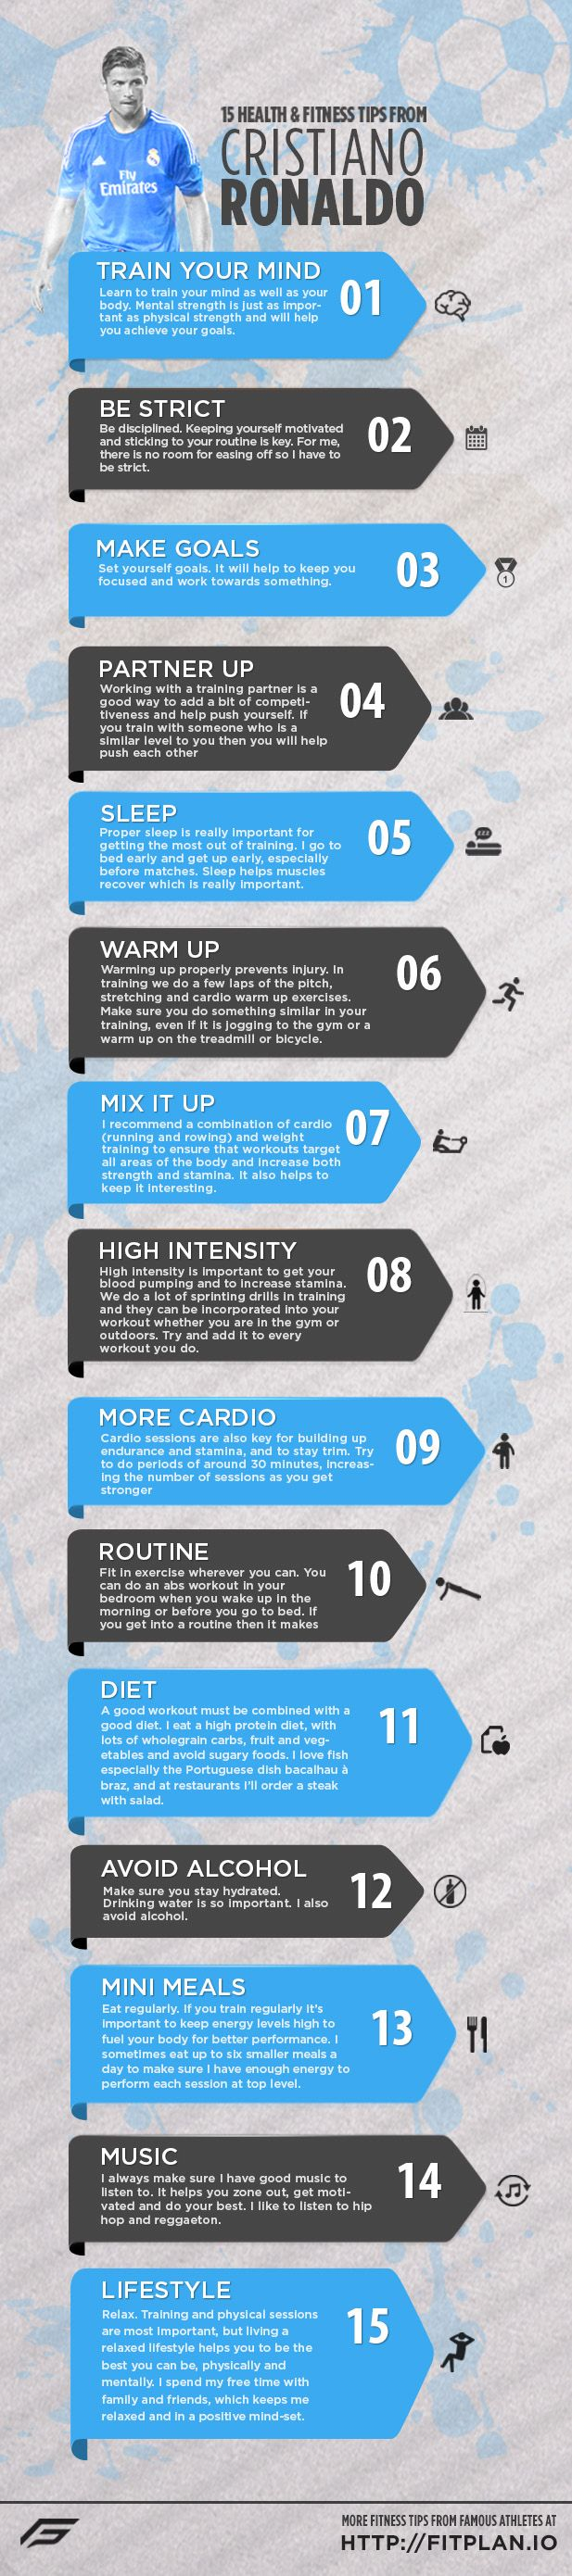 Cristiano Ronaldo's Fitness Tips Infographic